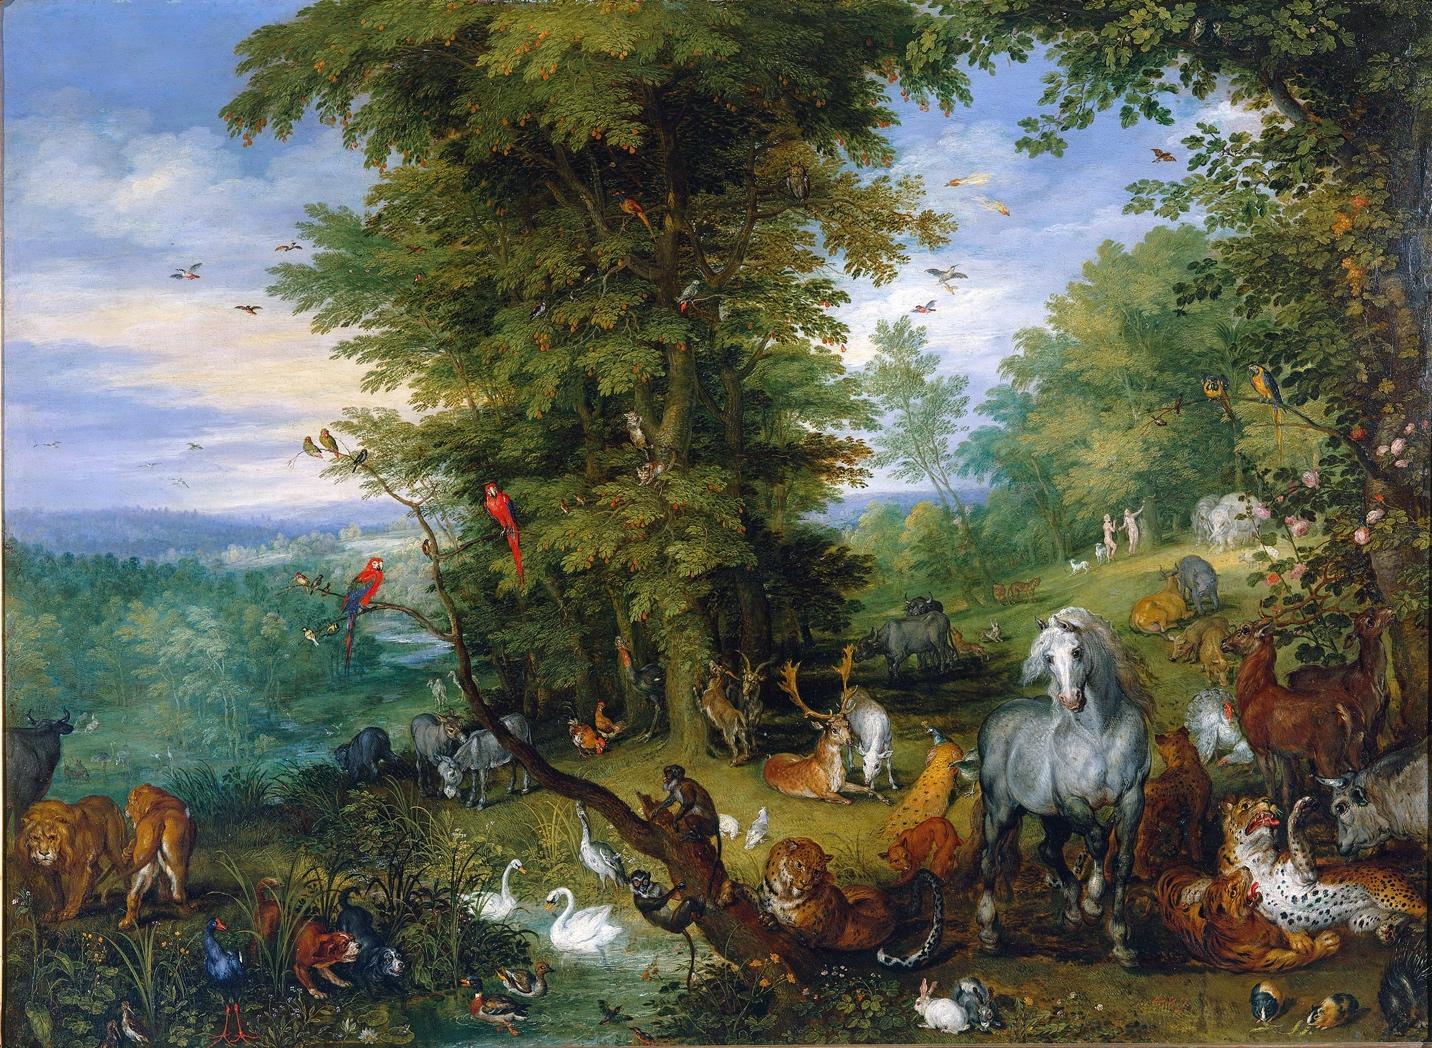 Jan Breughel, the Elder